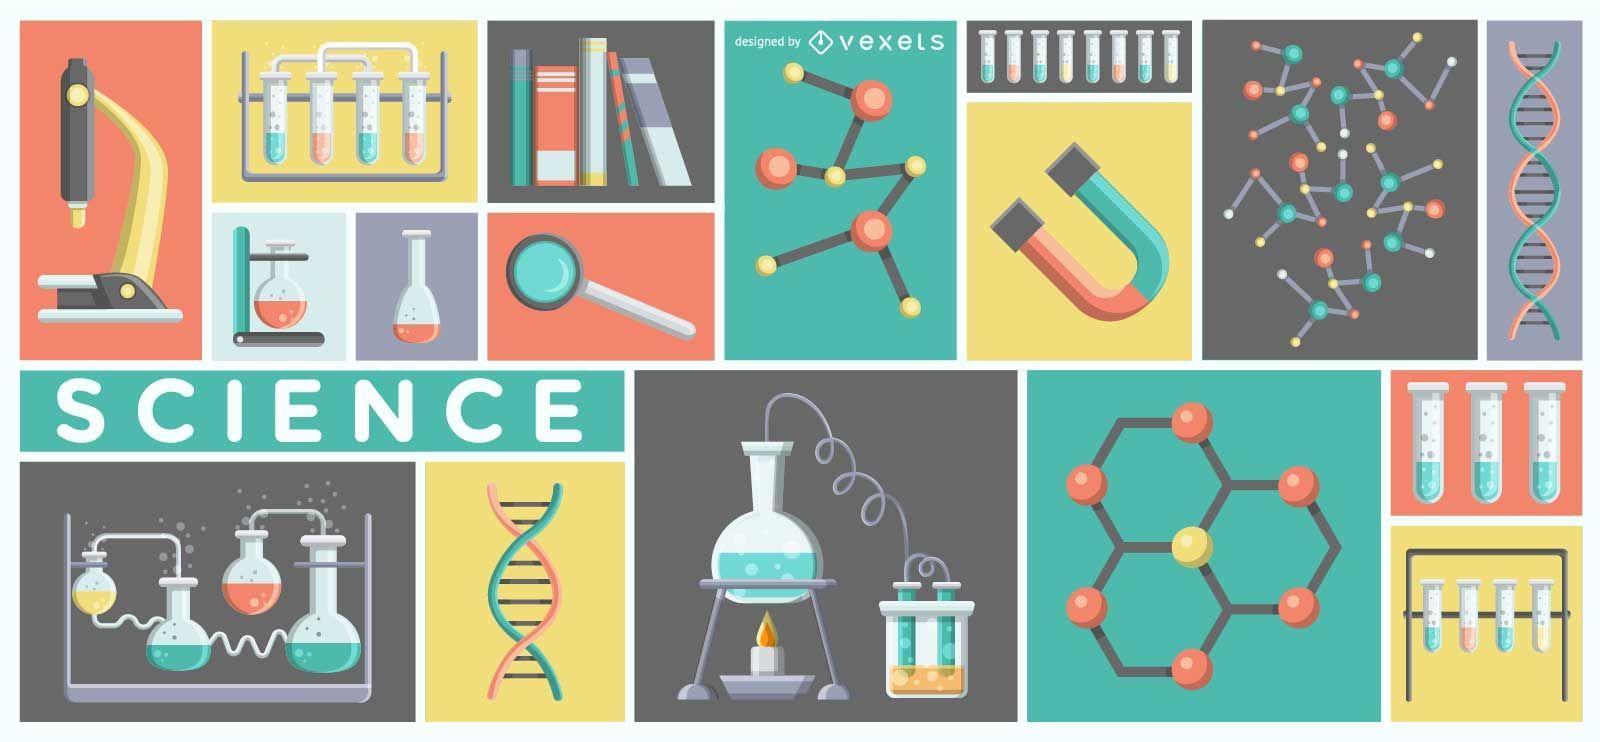 Science Laboratory Equipment Illustration